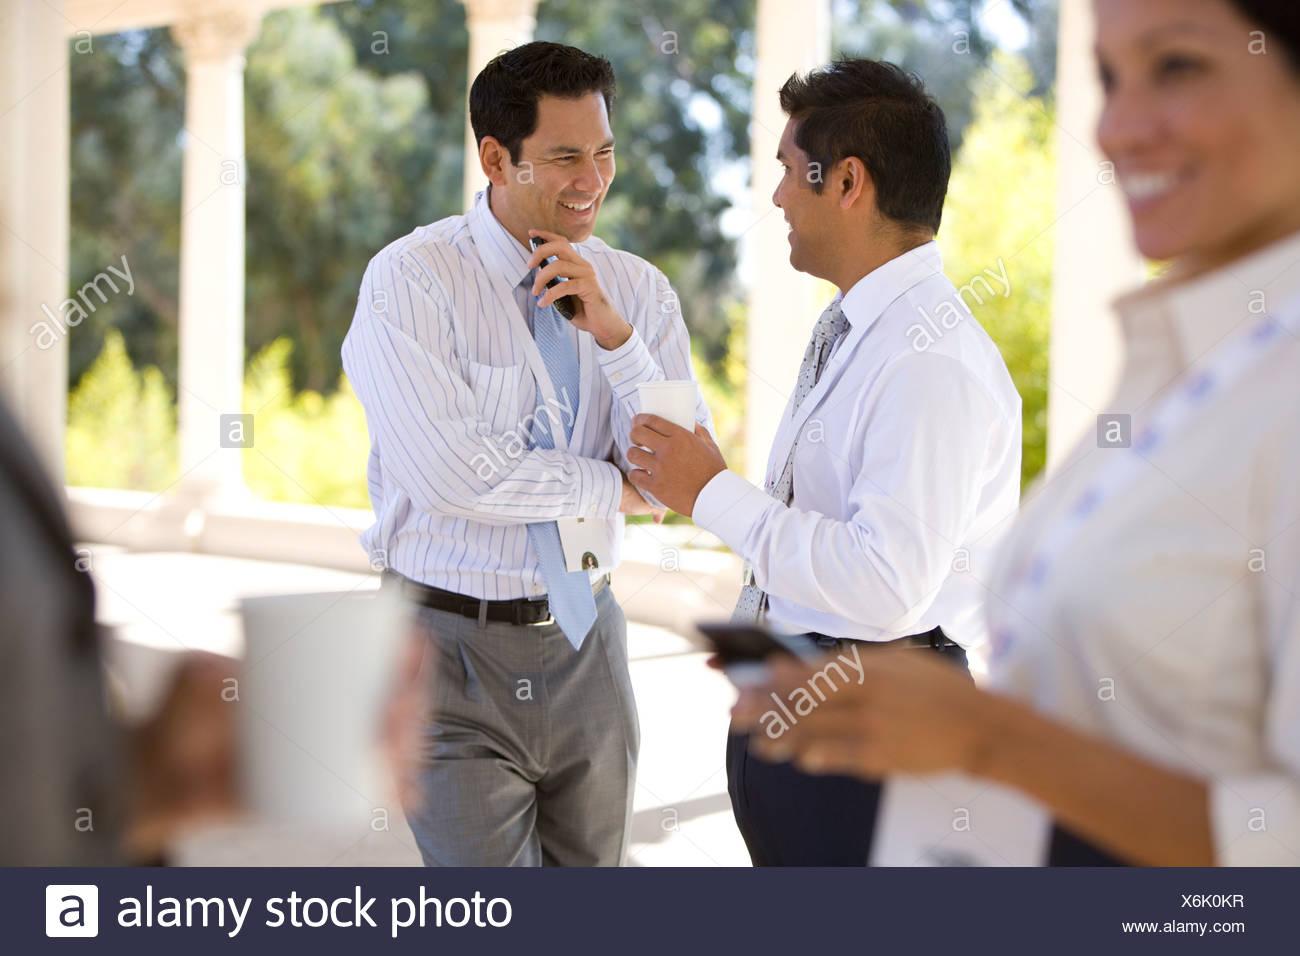 Businesspeople taking coffee break outdoors - Stock Image